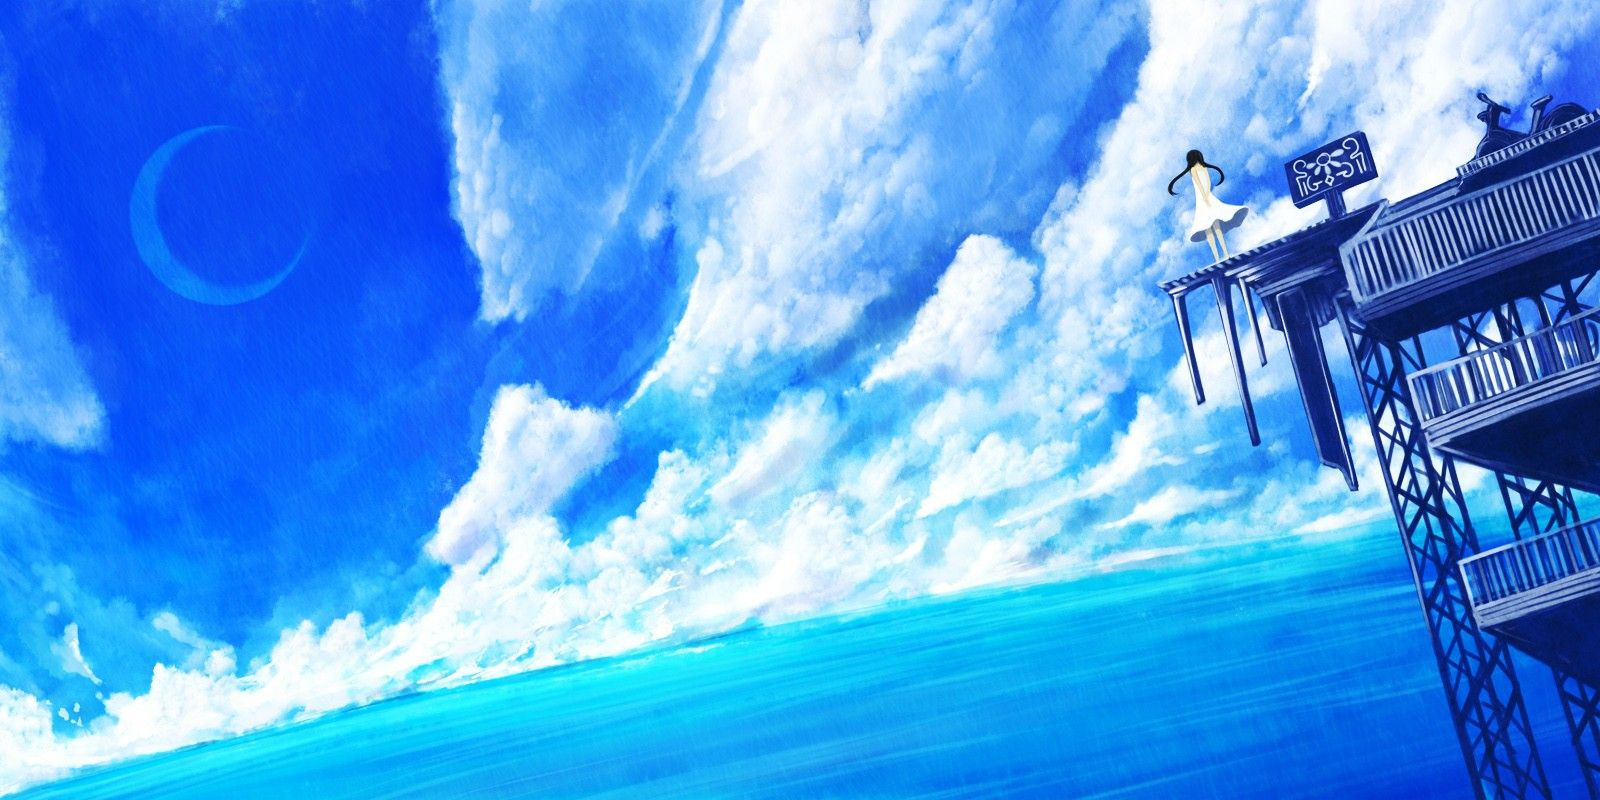 X Blue Anime Scenery Wallpaper X Id Wallpapervortex Com